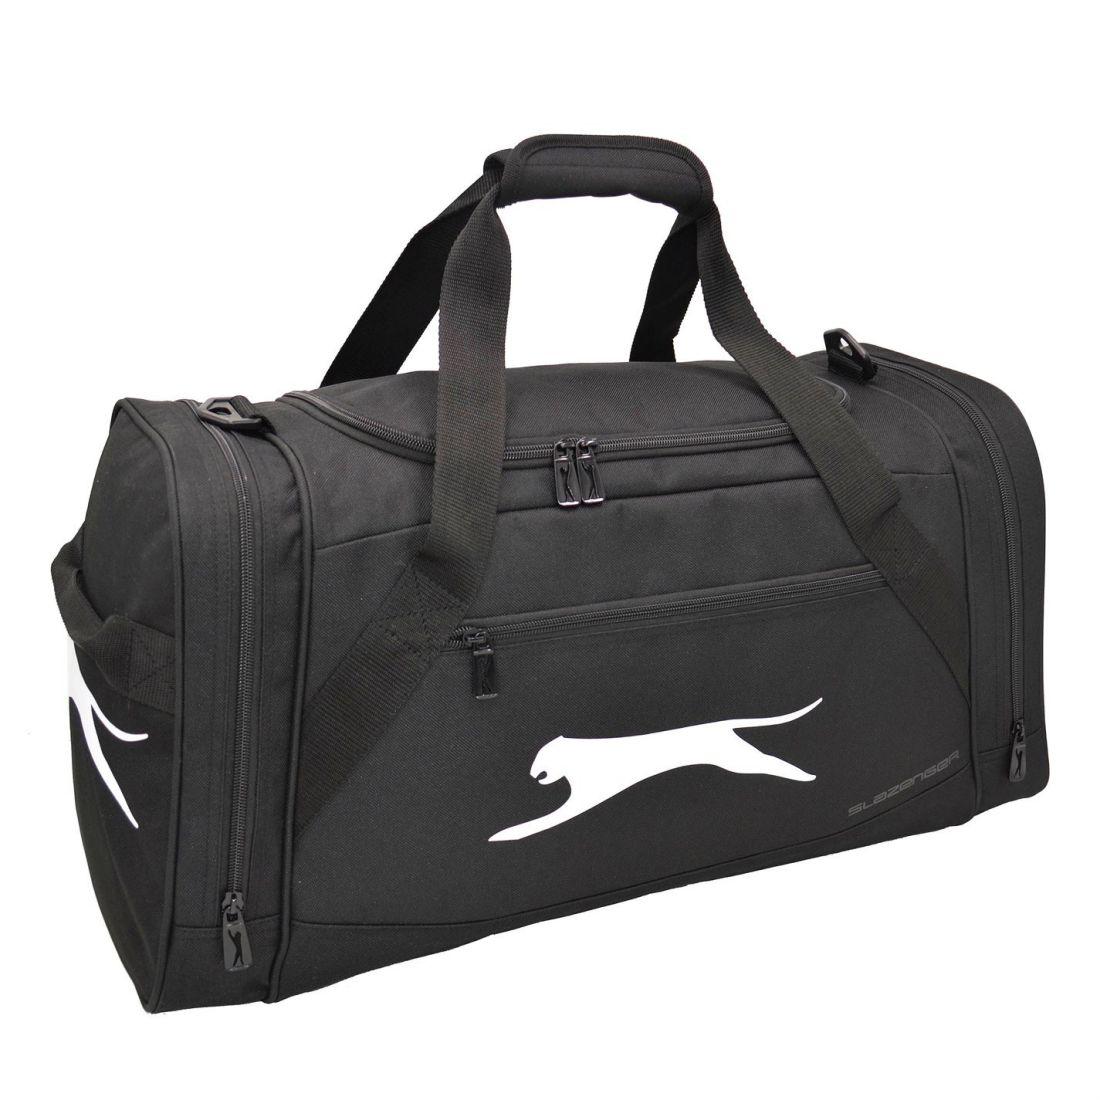 c0f36bd8f9 Slazenger Medium Holdall Zip Pockets Baggage Traveling Sack Accessory